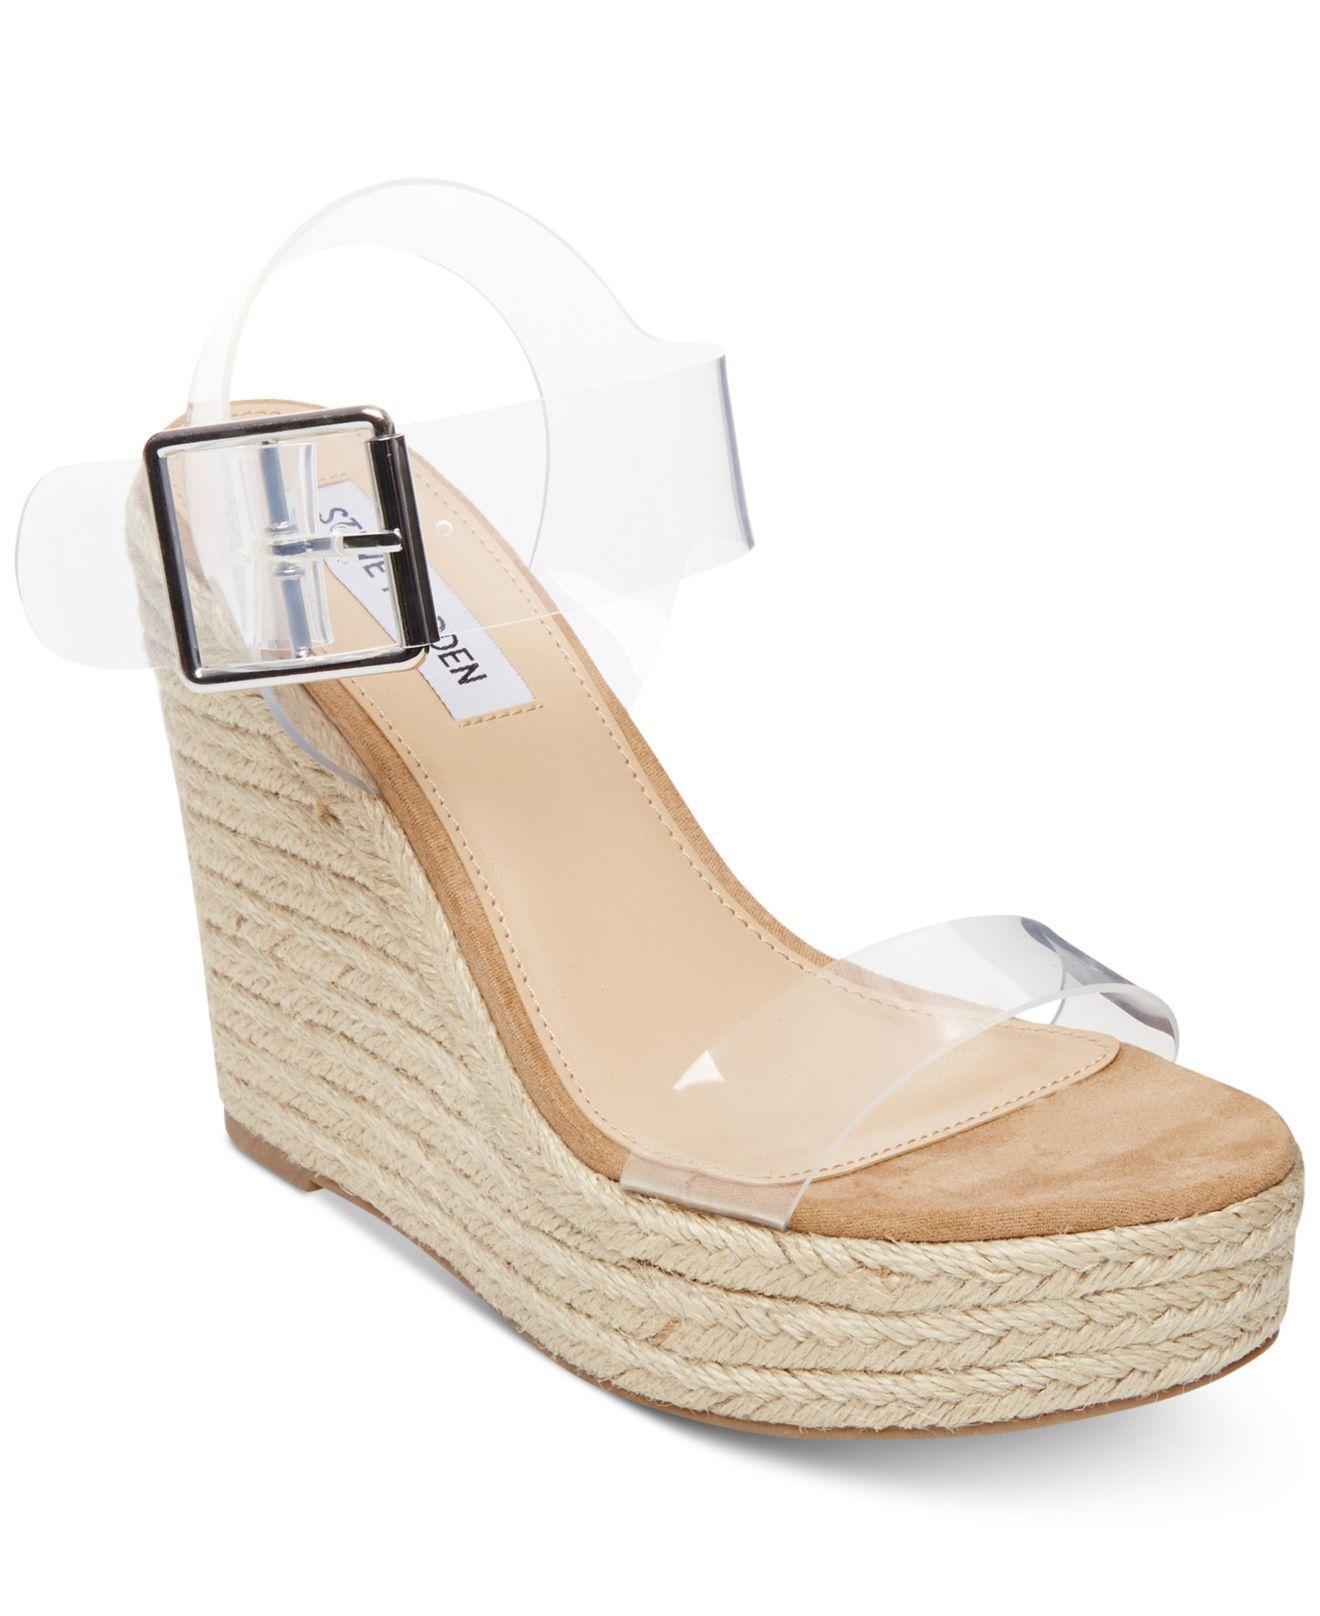 036c550d0c9 Lyst - Steve Madden Splash Espadrille Sandal - Save 20%